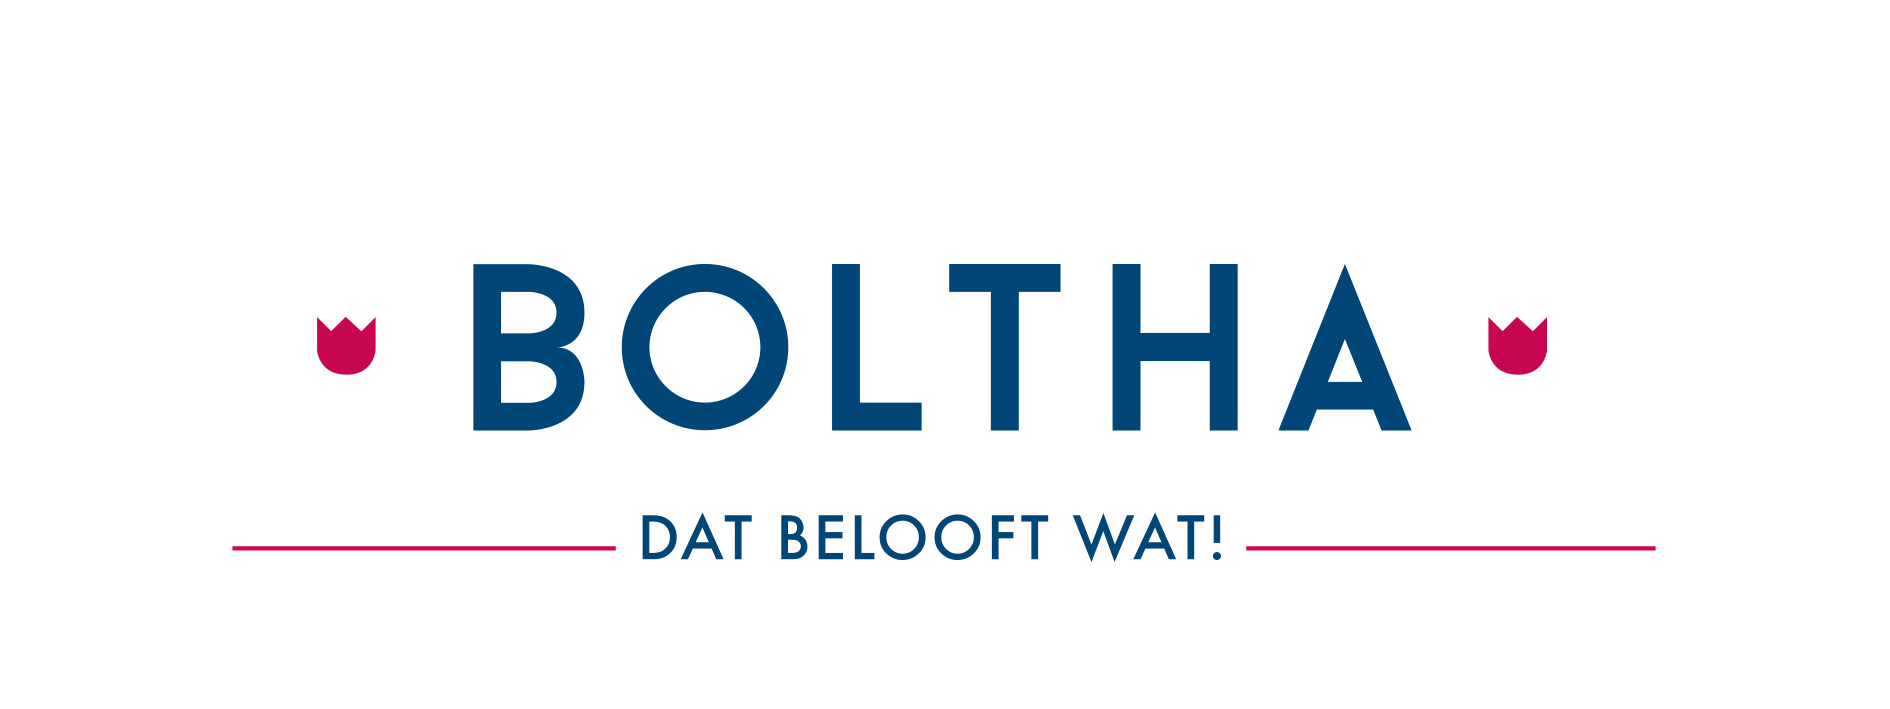 Huisstijl Boltha